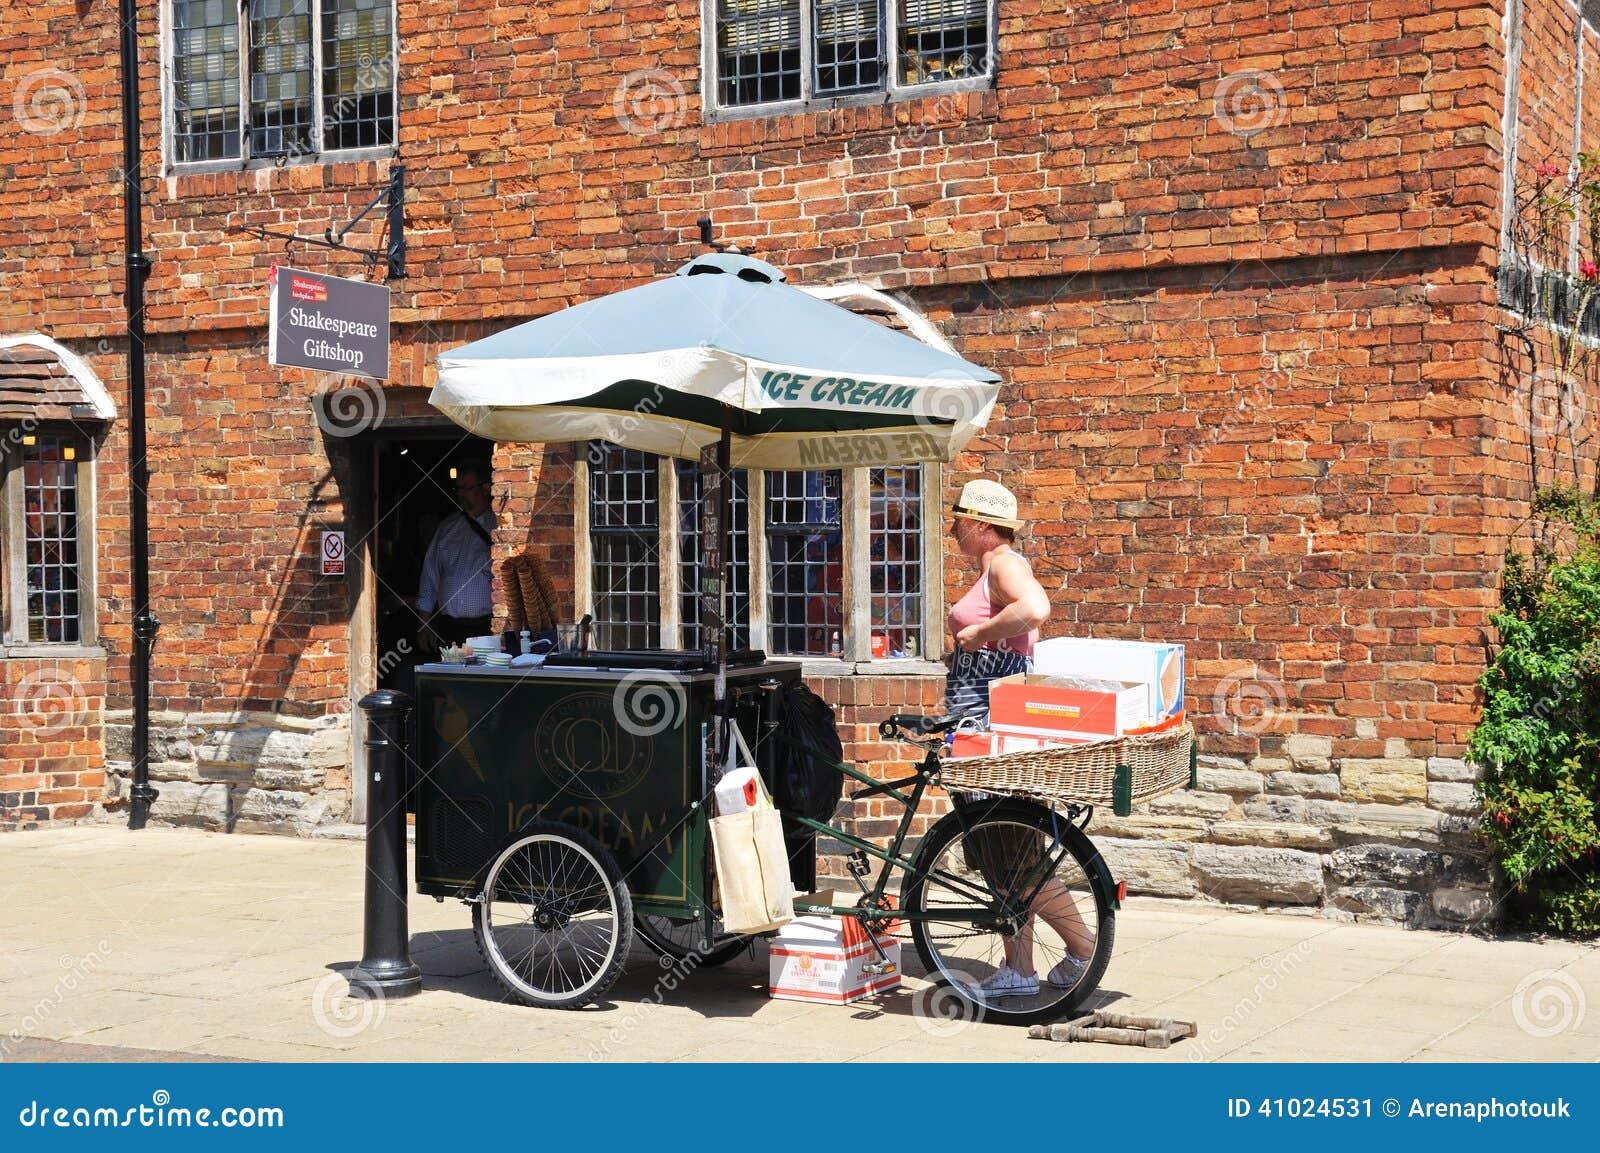 Ice Cream seller, Stratford-upon-Avon.